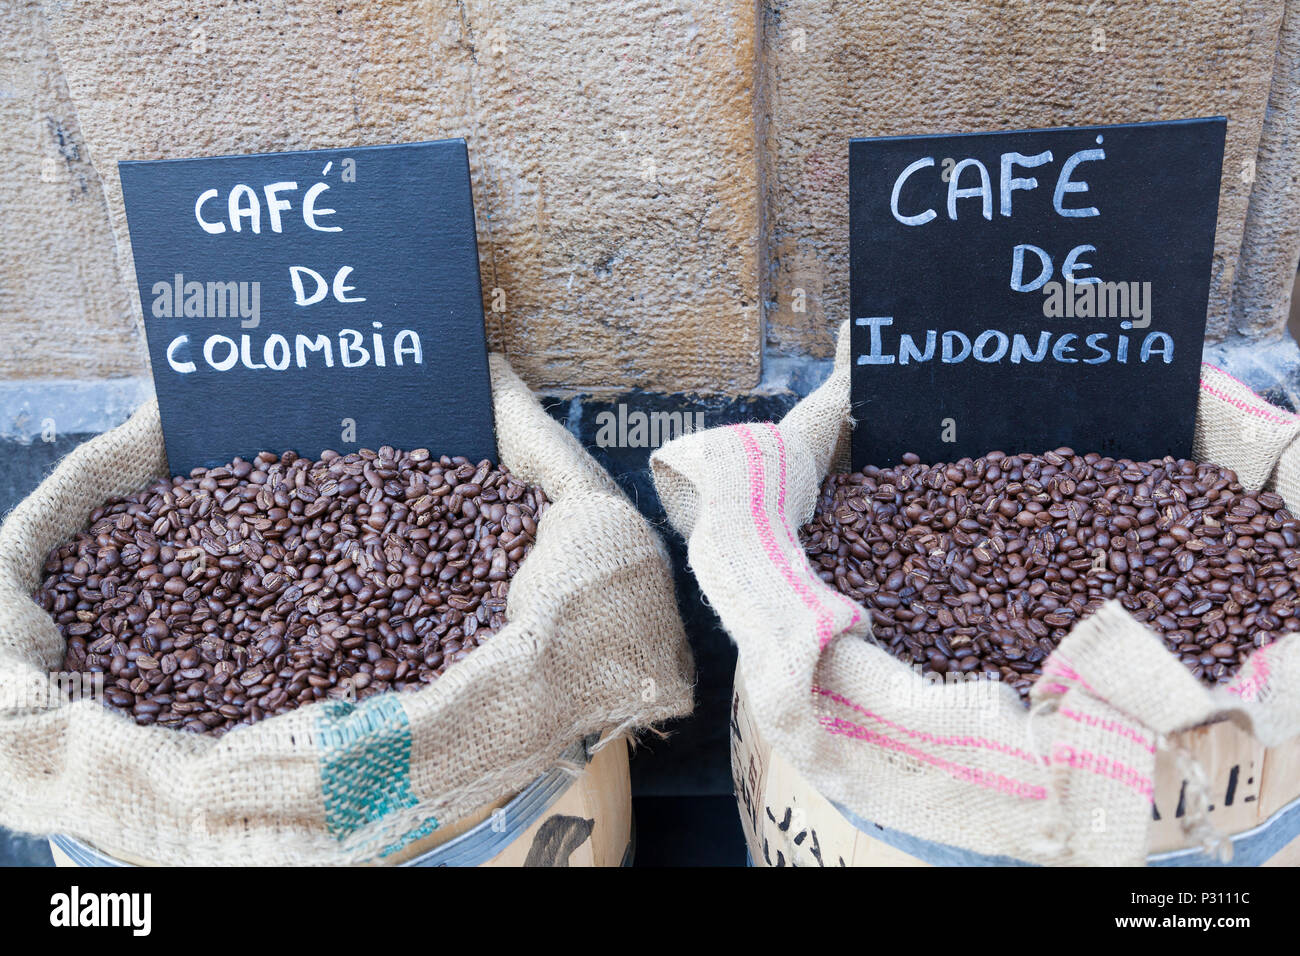 Tow sacks of coffee beans, one Columbian, one Indonesian,  Bilbao, Spain. - Stock Image